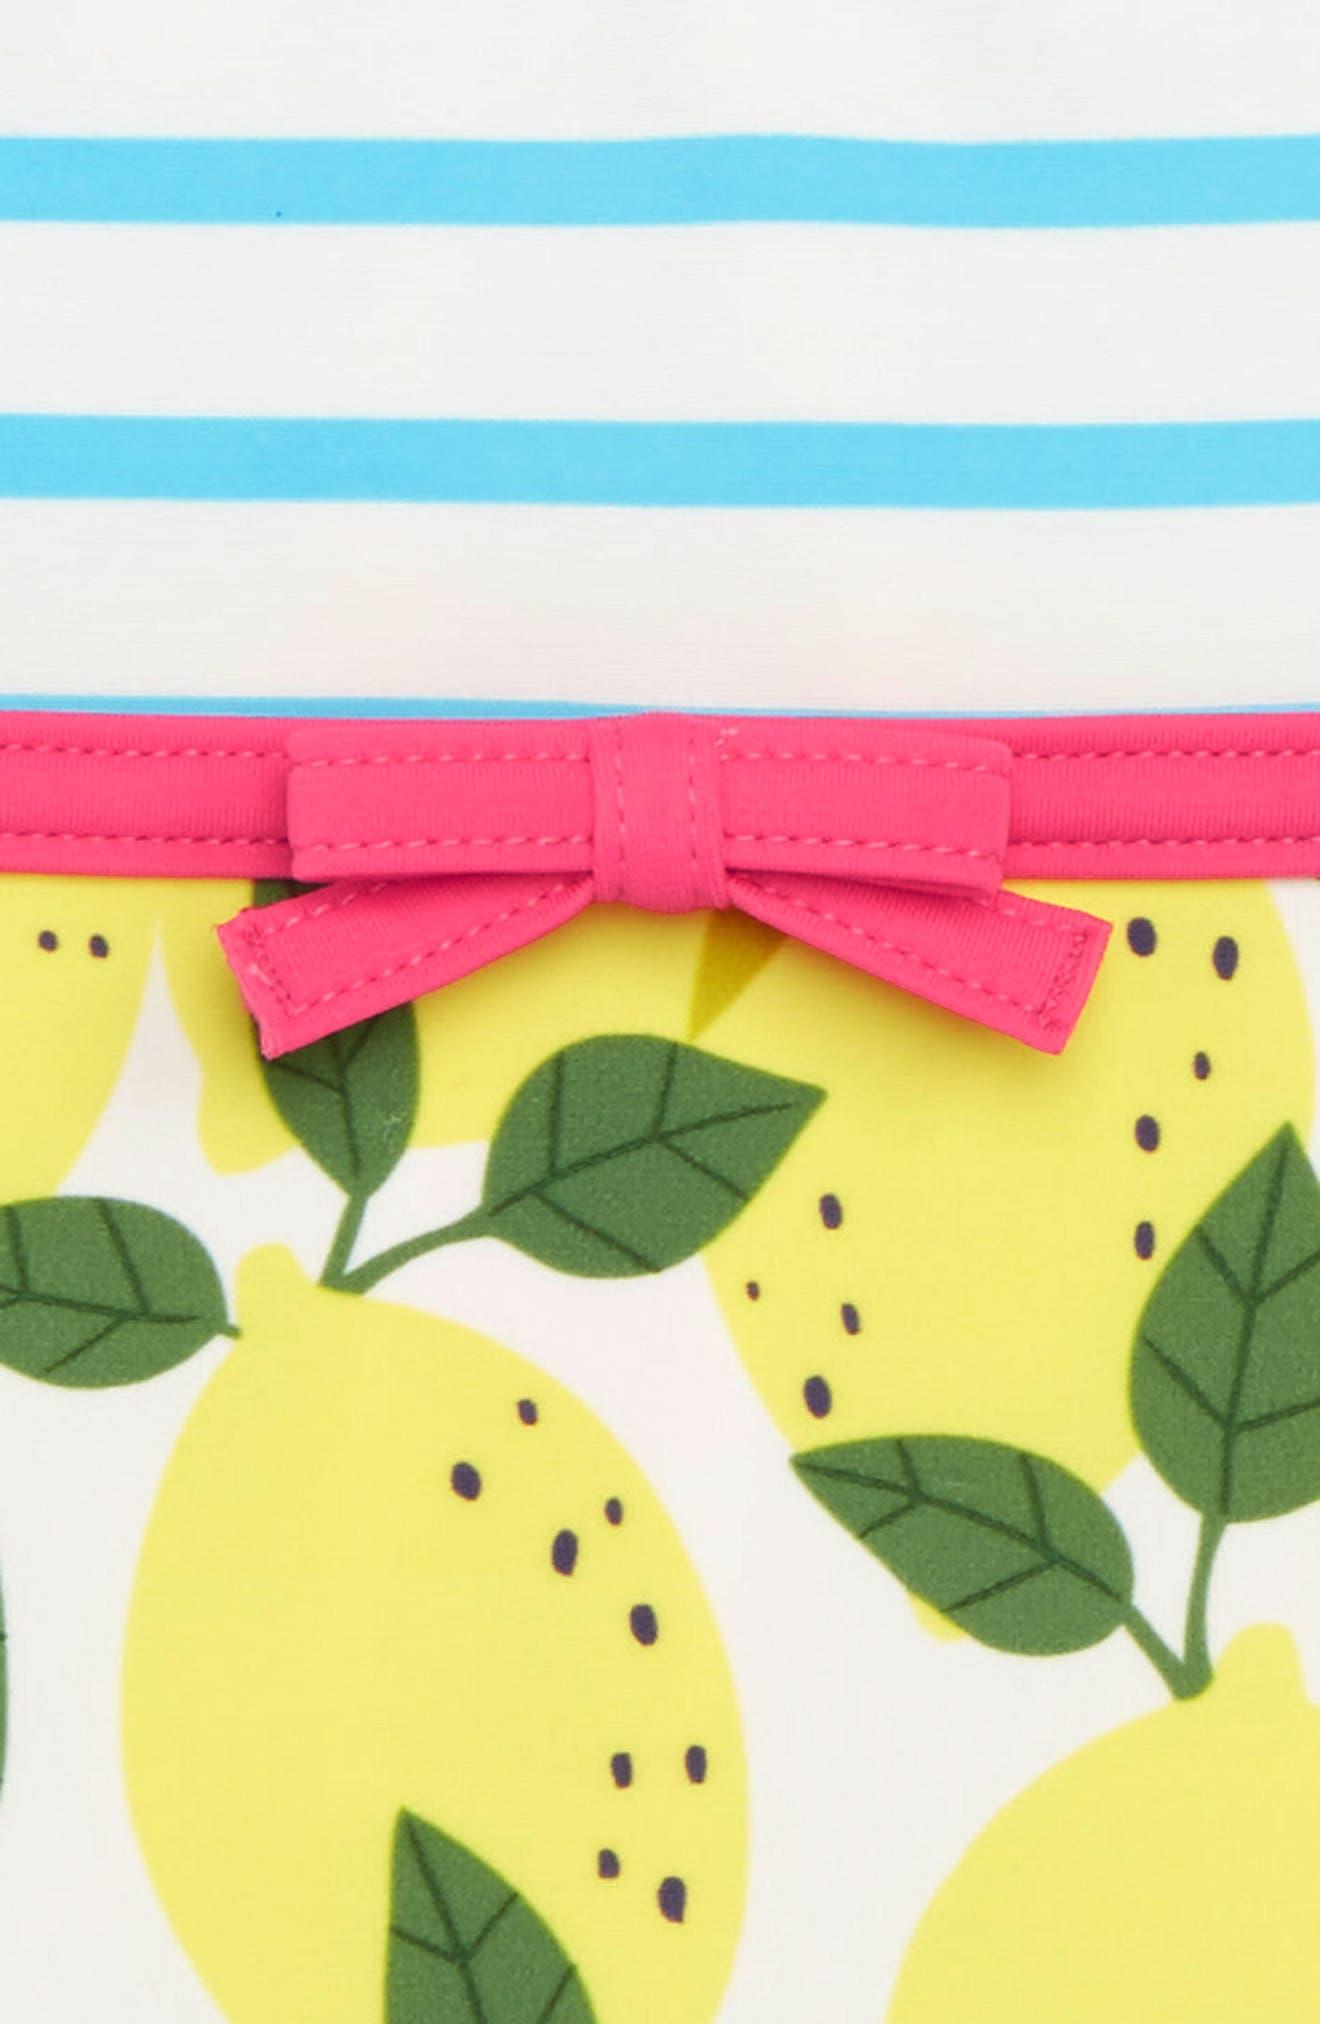 Hotchpotch One-Piece Swimsuit,                             Alternate thumbnail 2, color,                             Ivory Lemon Tree Yel